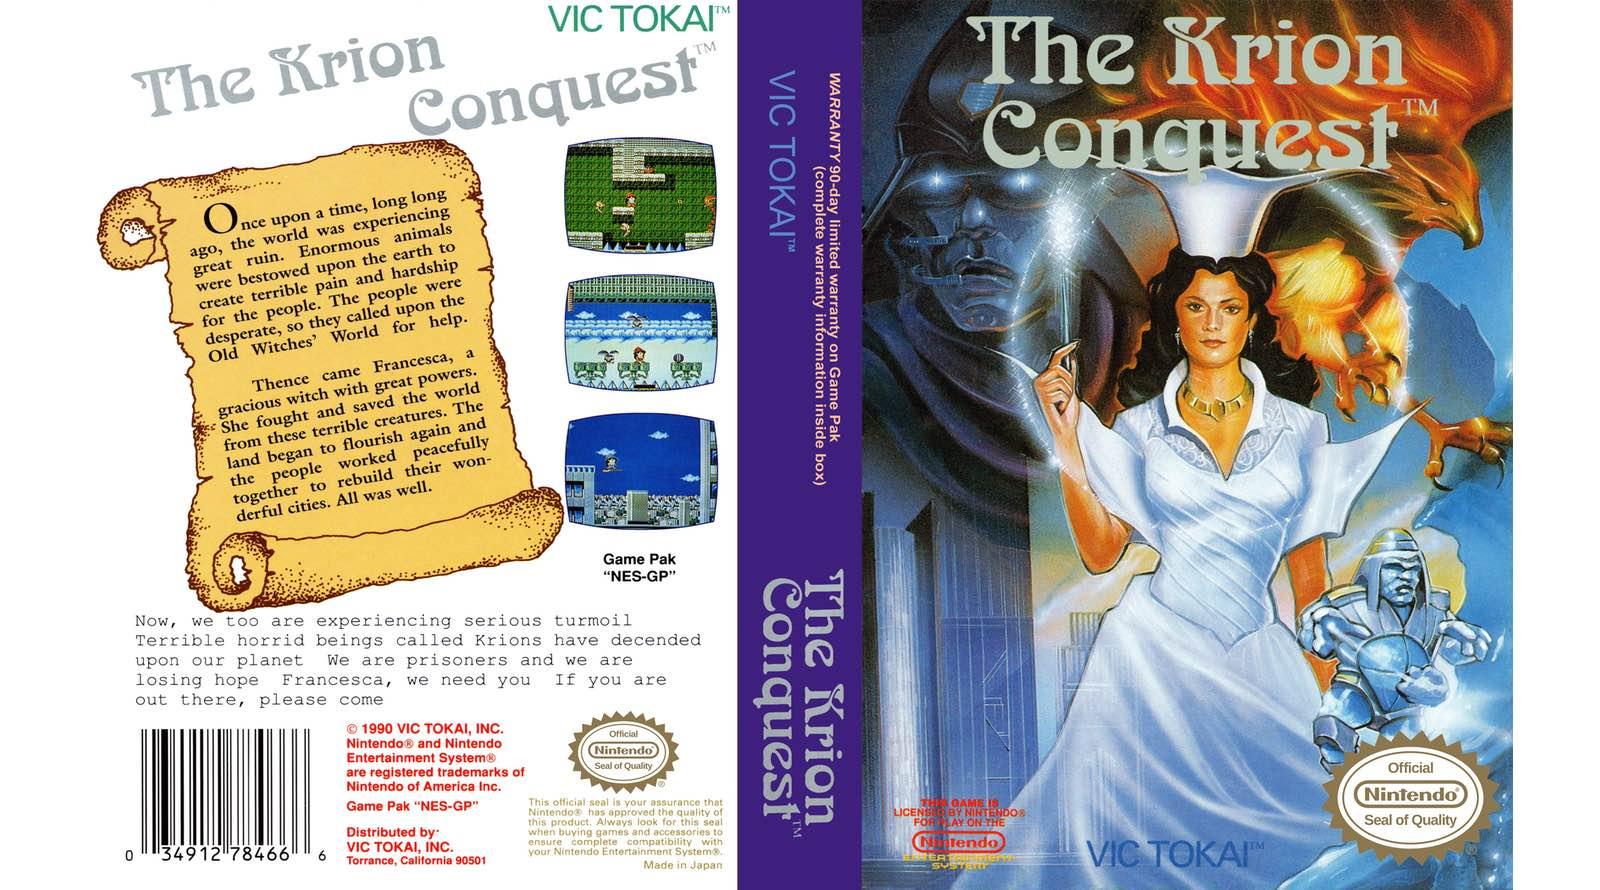 feat-krion-conquest